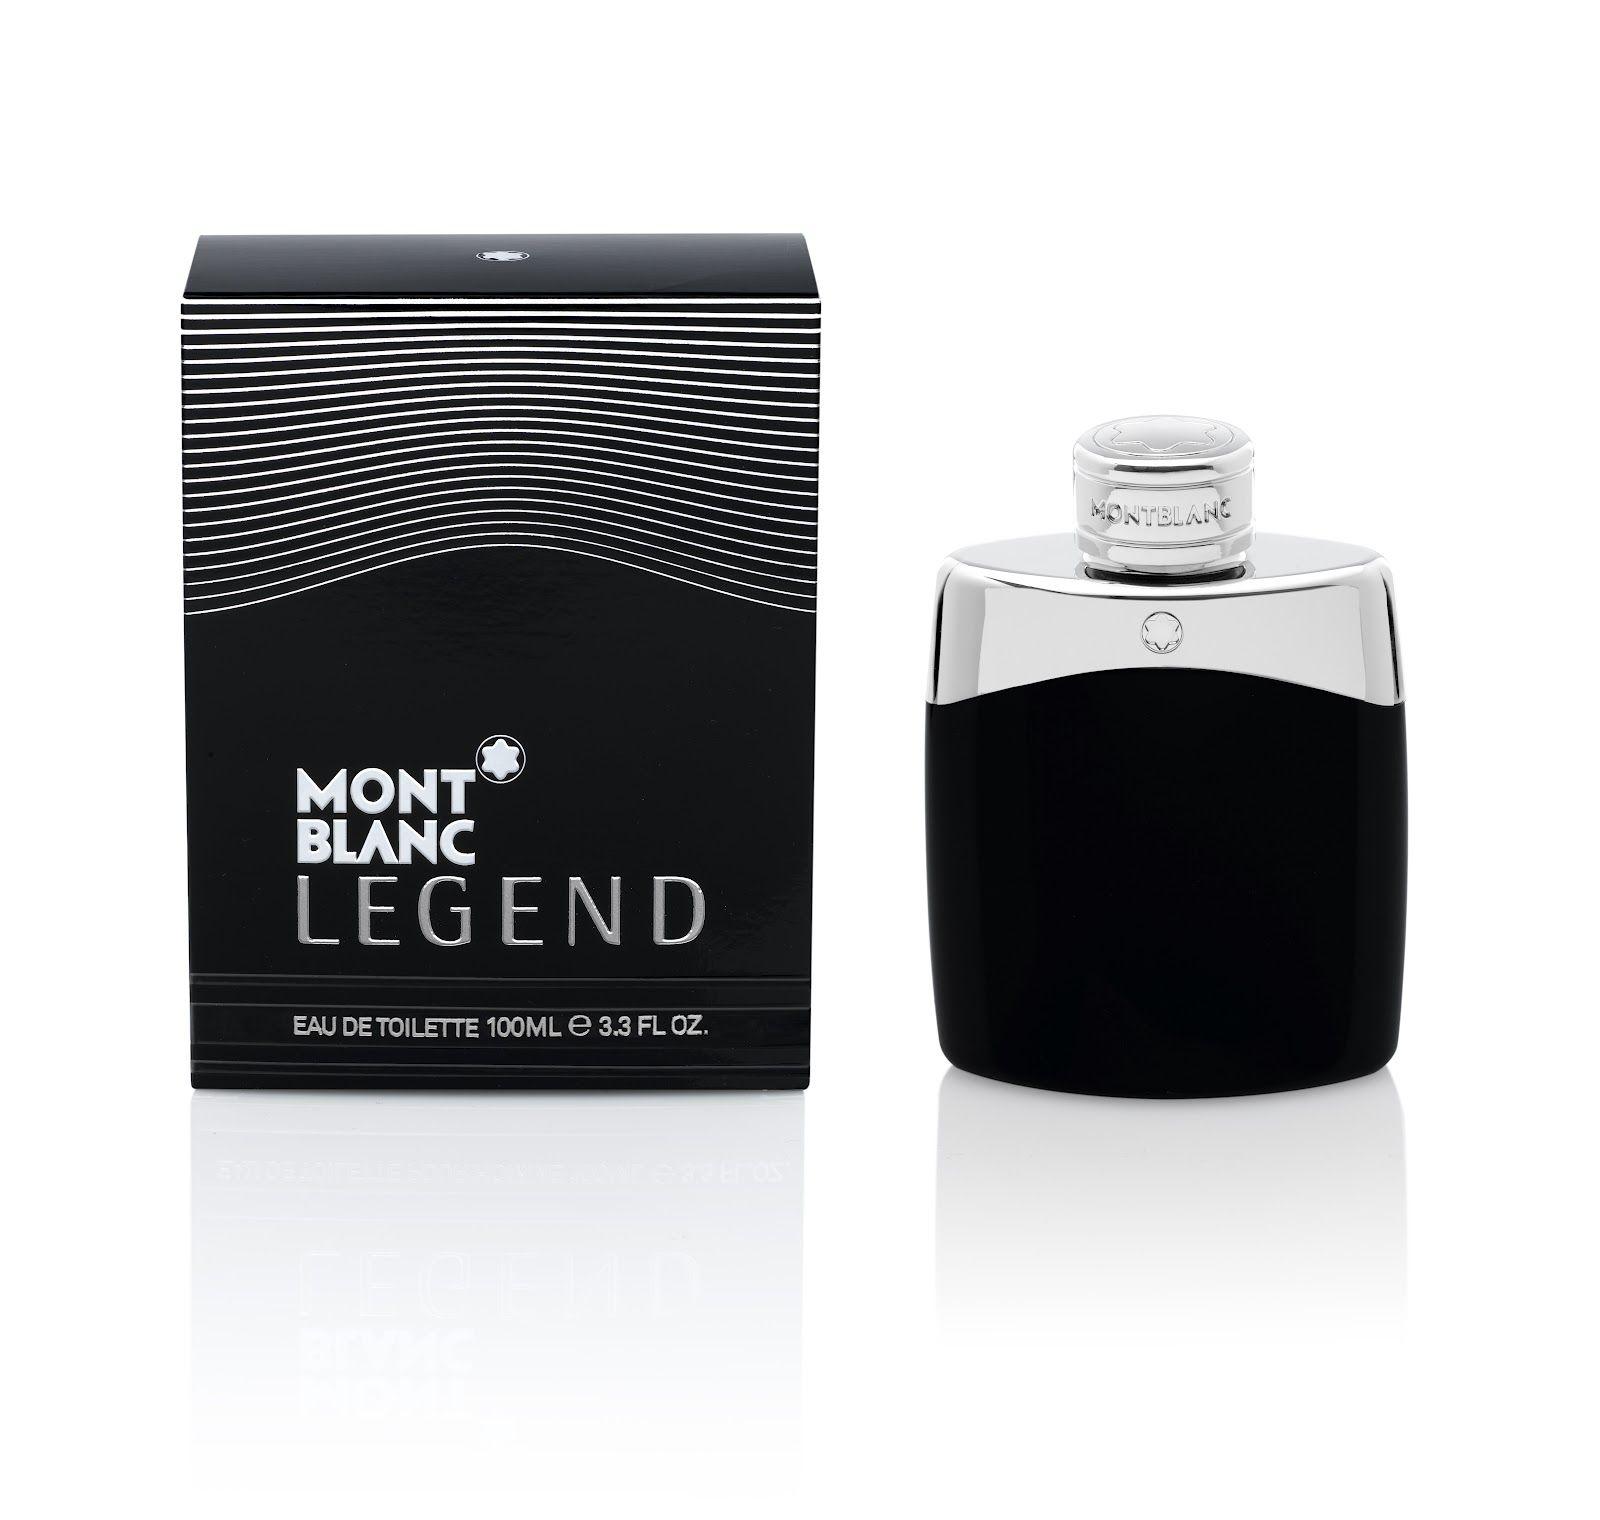 montblanc perfume De Voga En Voga Perfumados según la